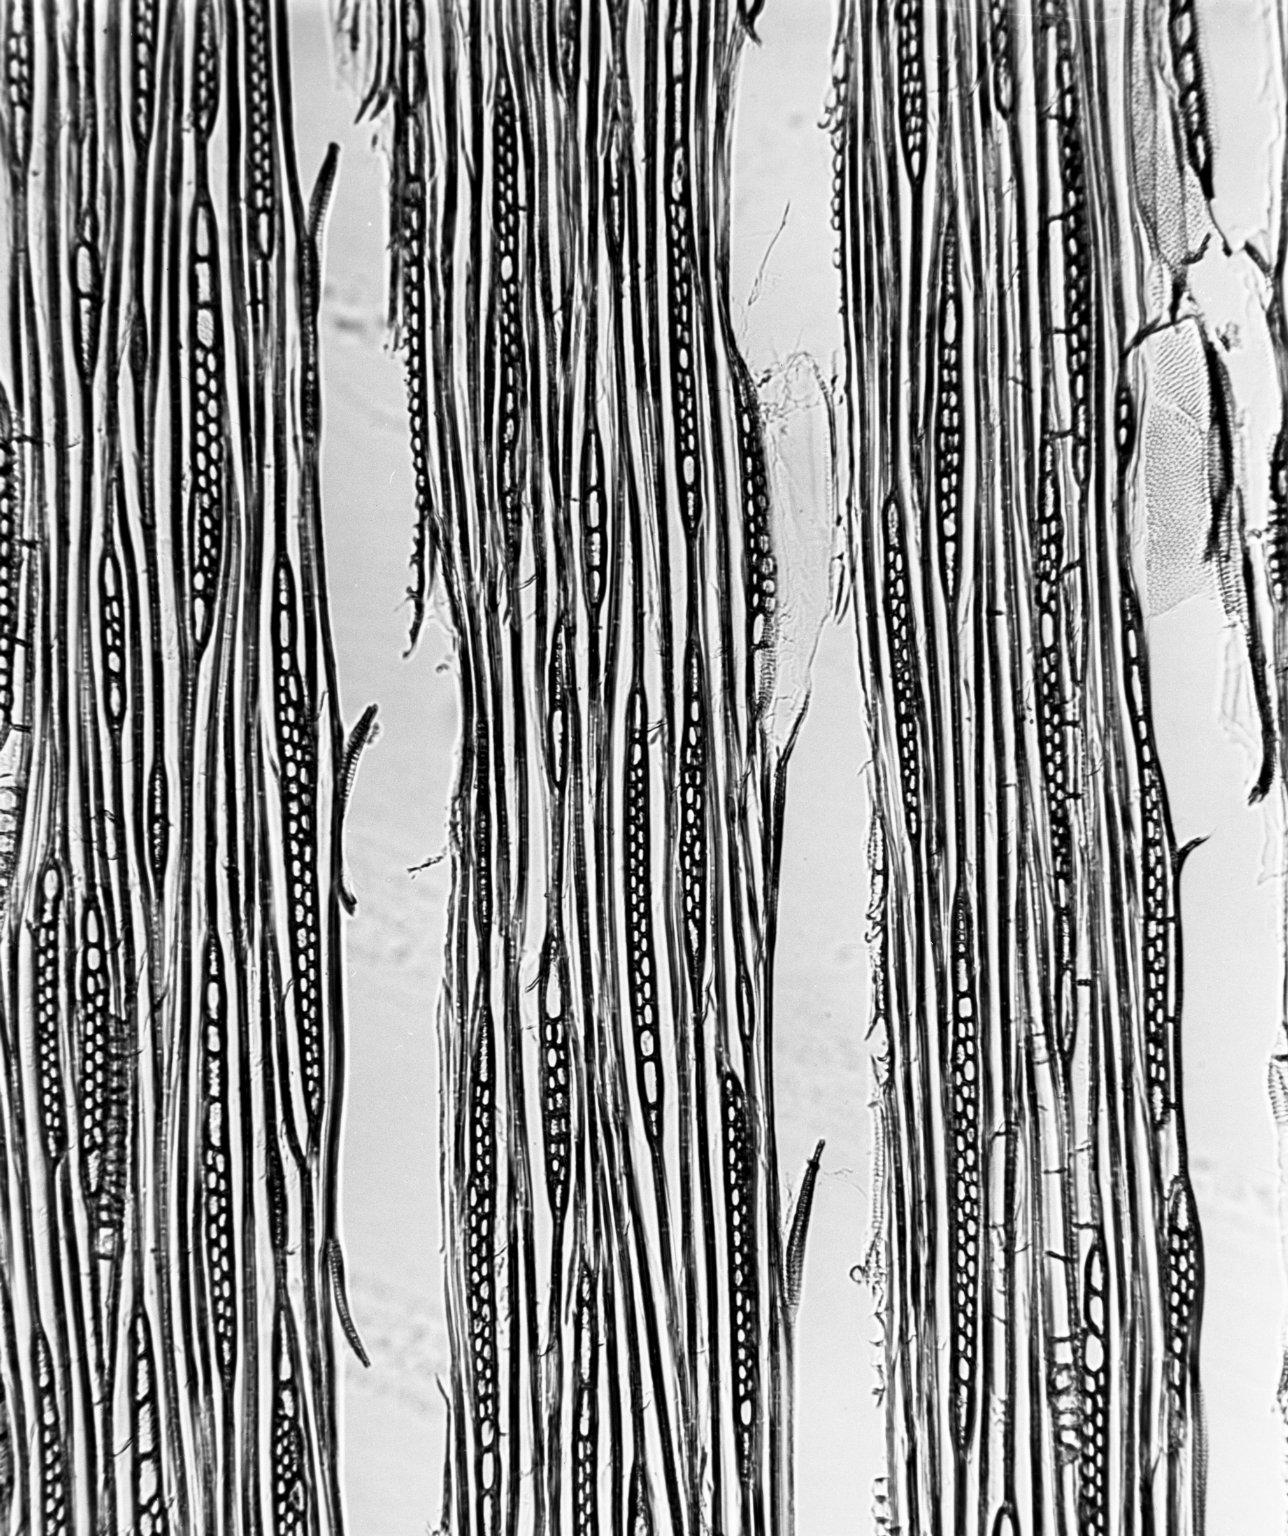 APOCYNACEAE Holarrhena congolensis